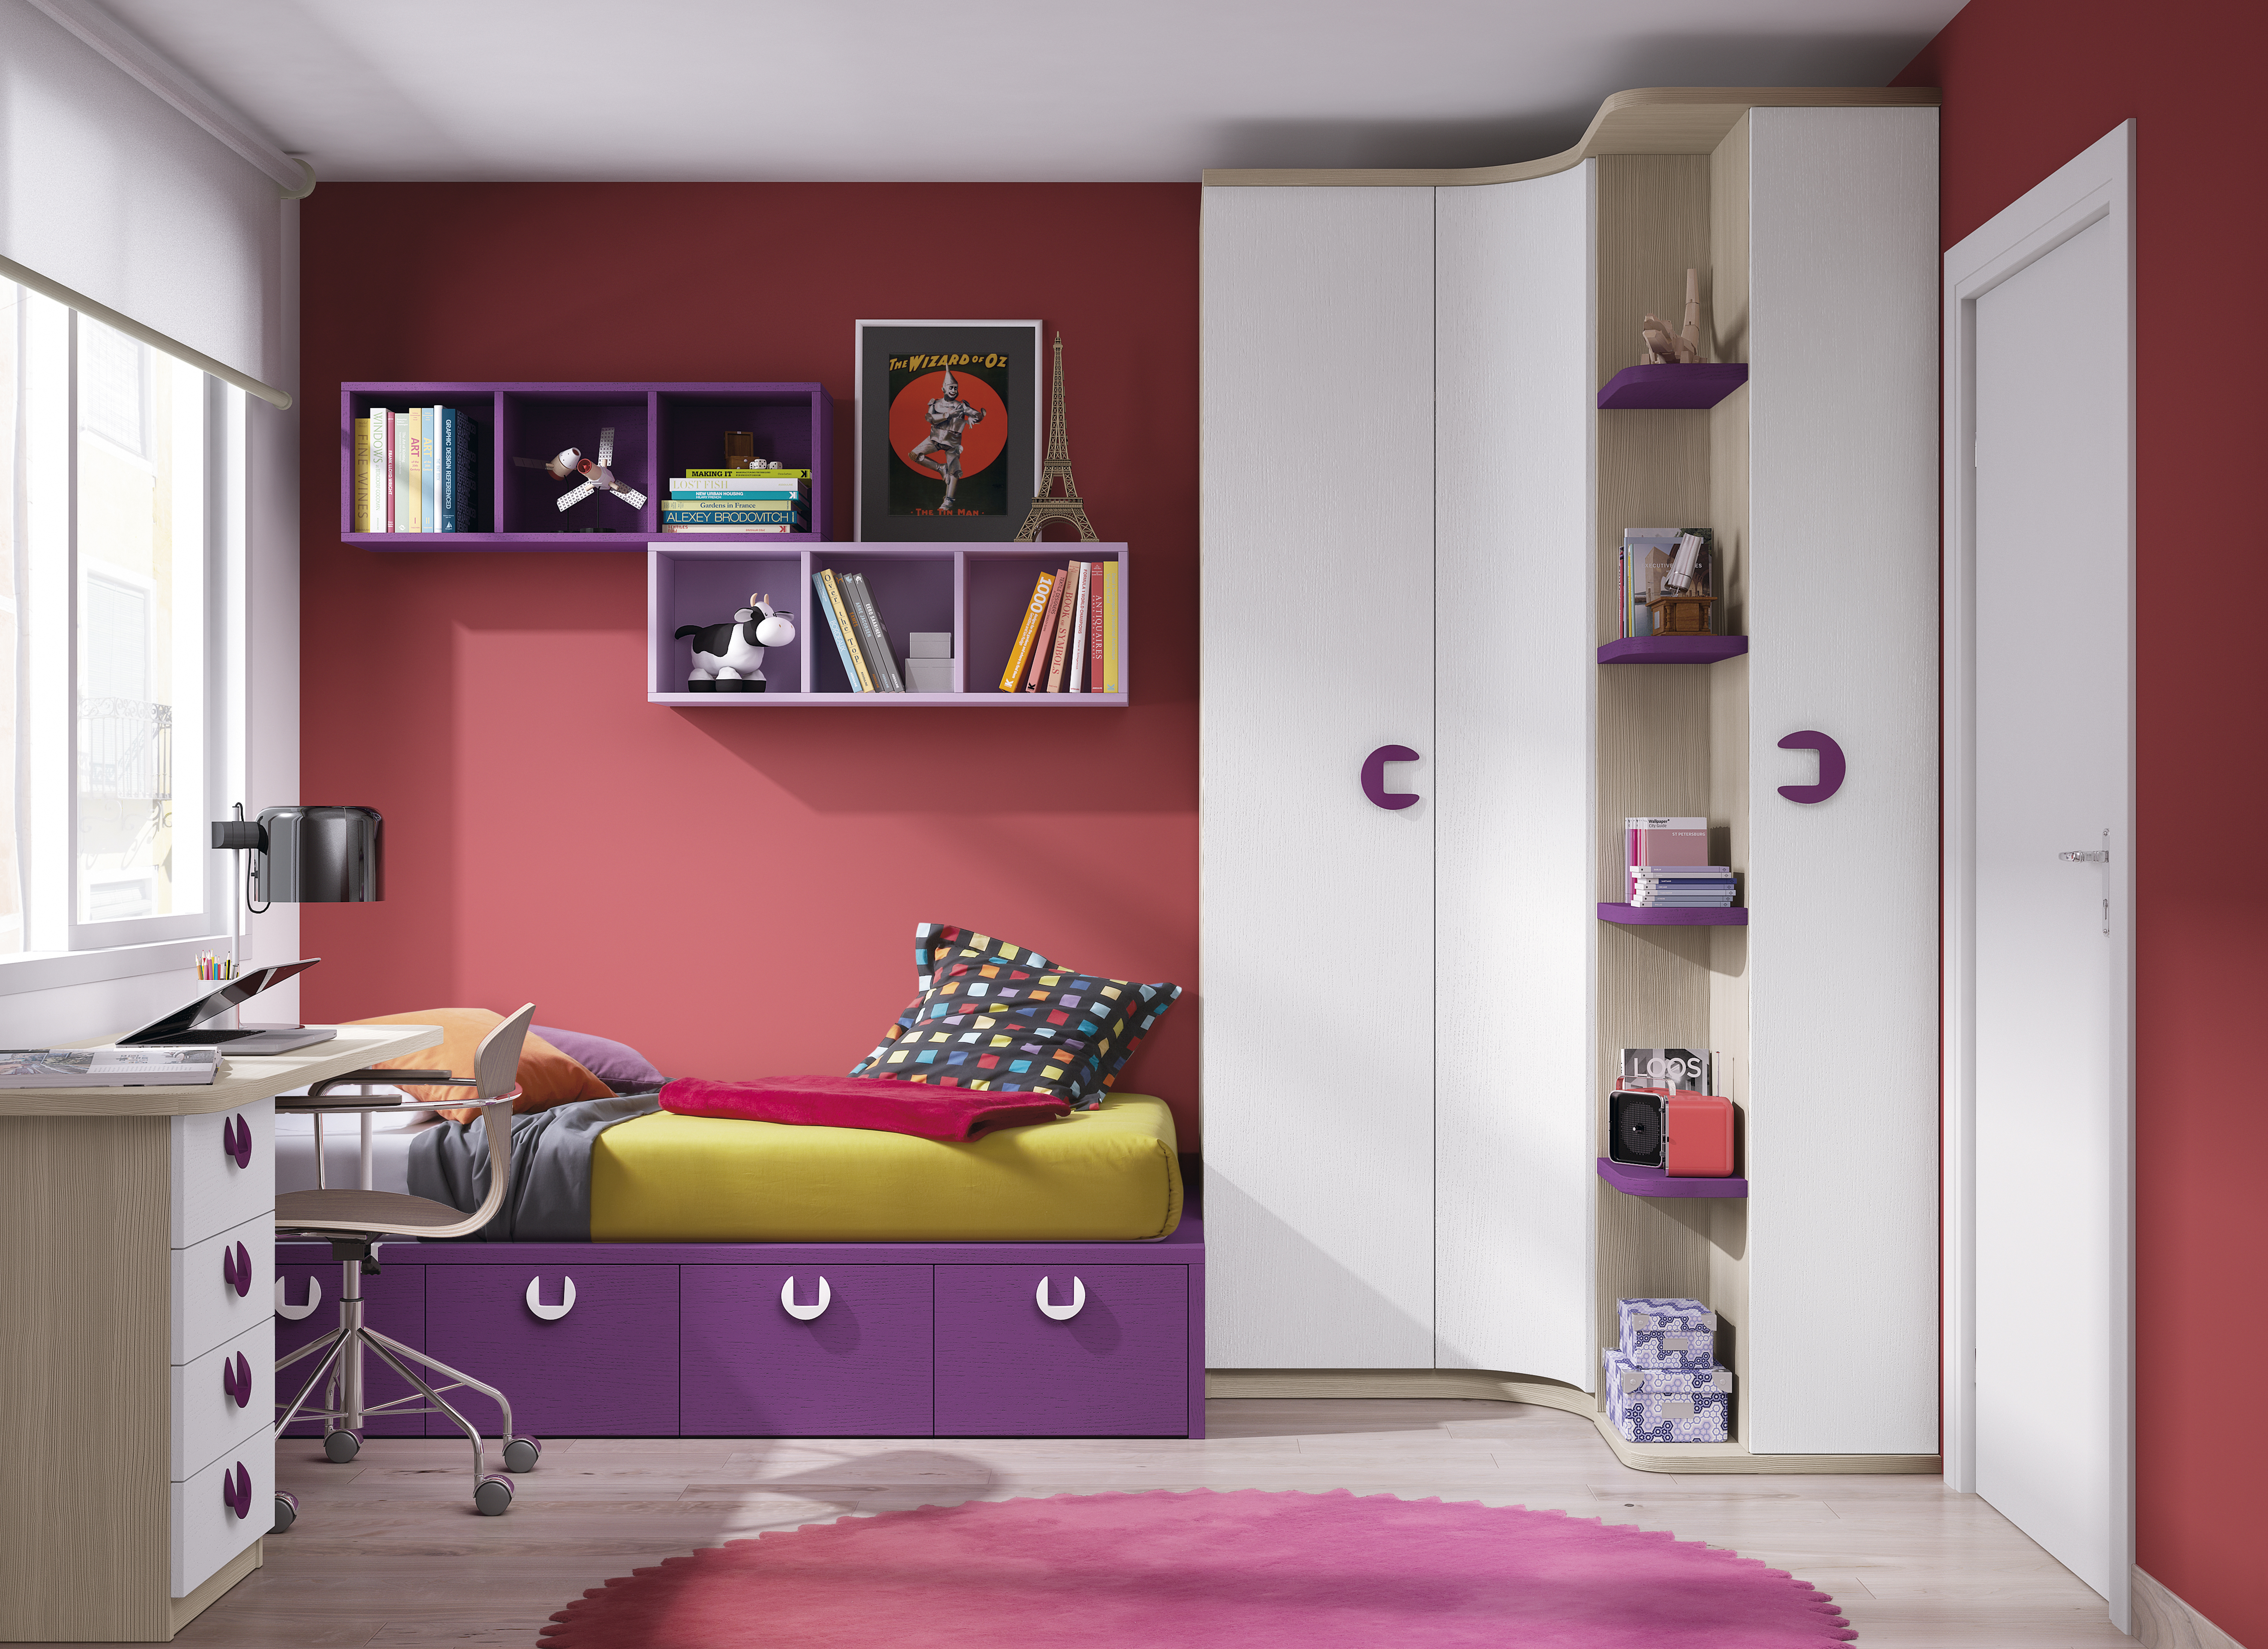 Dormitorios Juveniles Nietohogar ~ Alfombras Para Dormitorios Juveniles